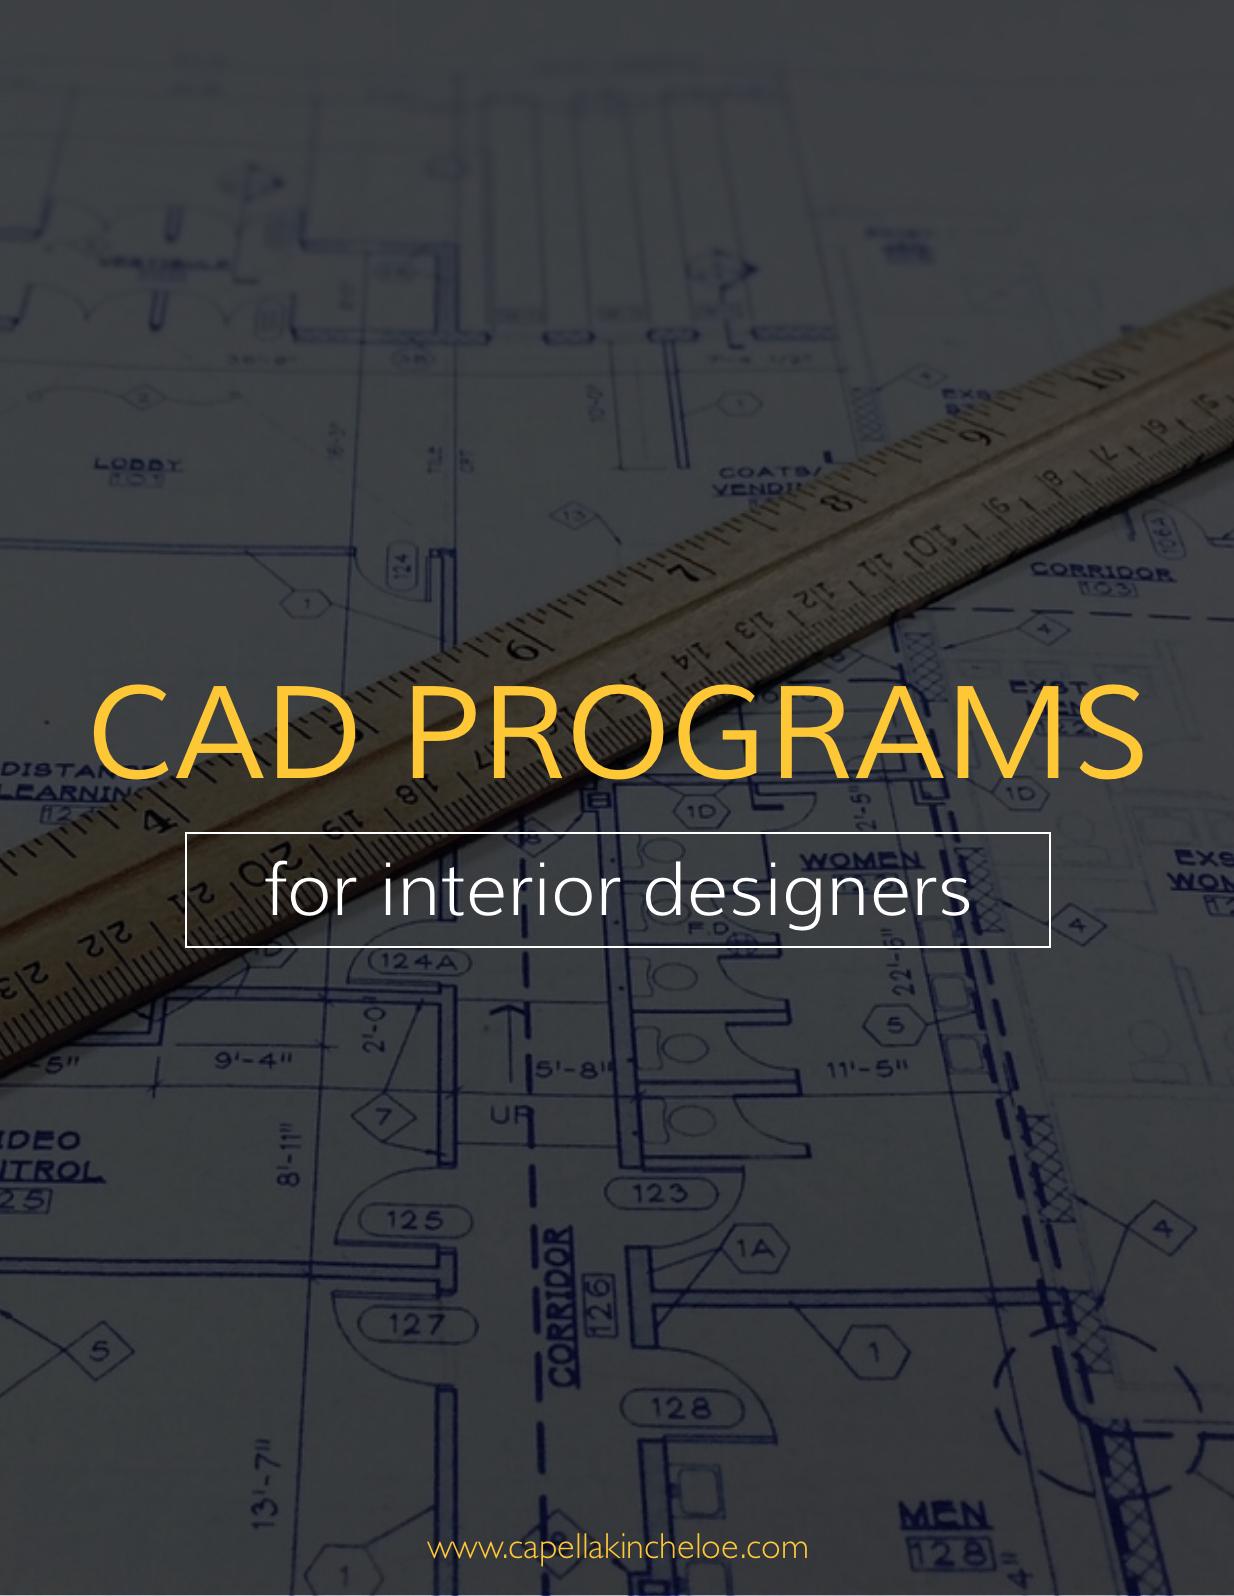 Interiors design wallpapers » interior design business software